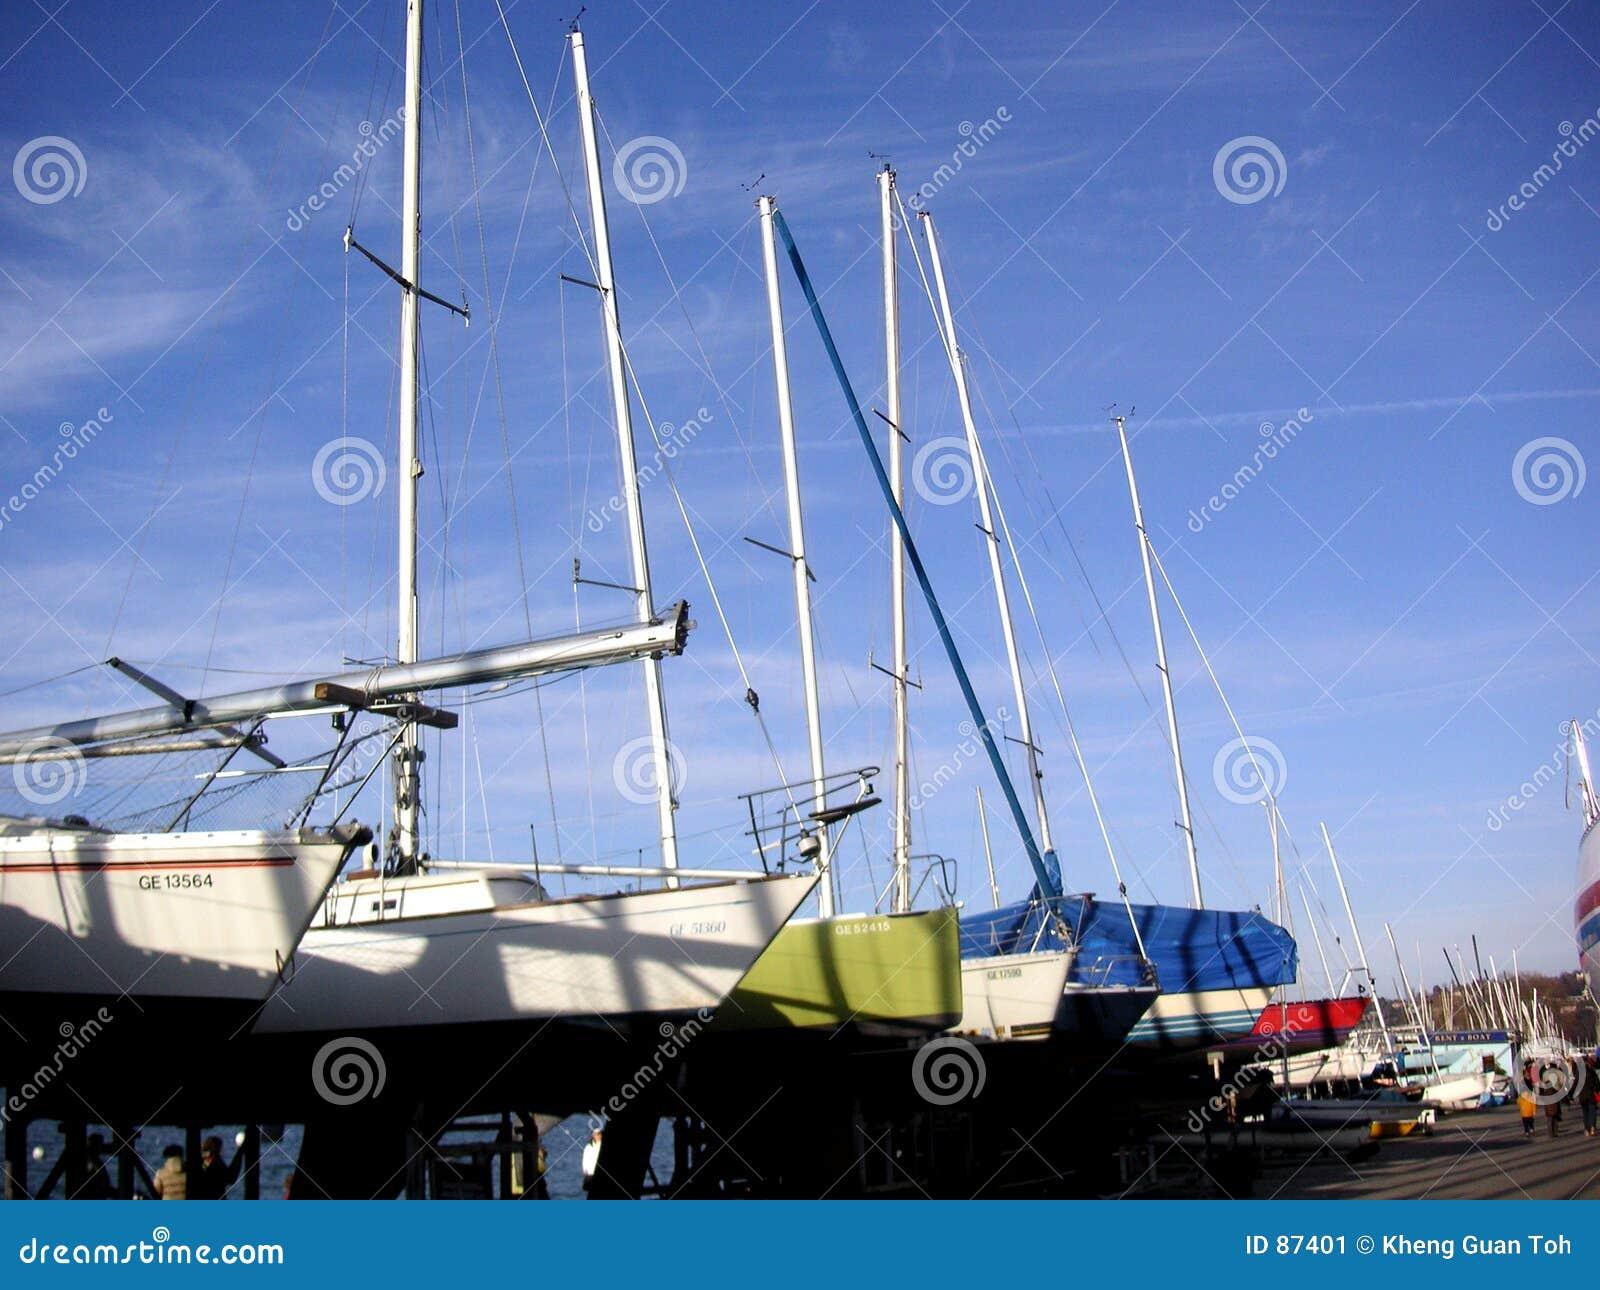 Row yachts